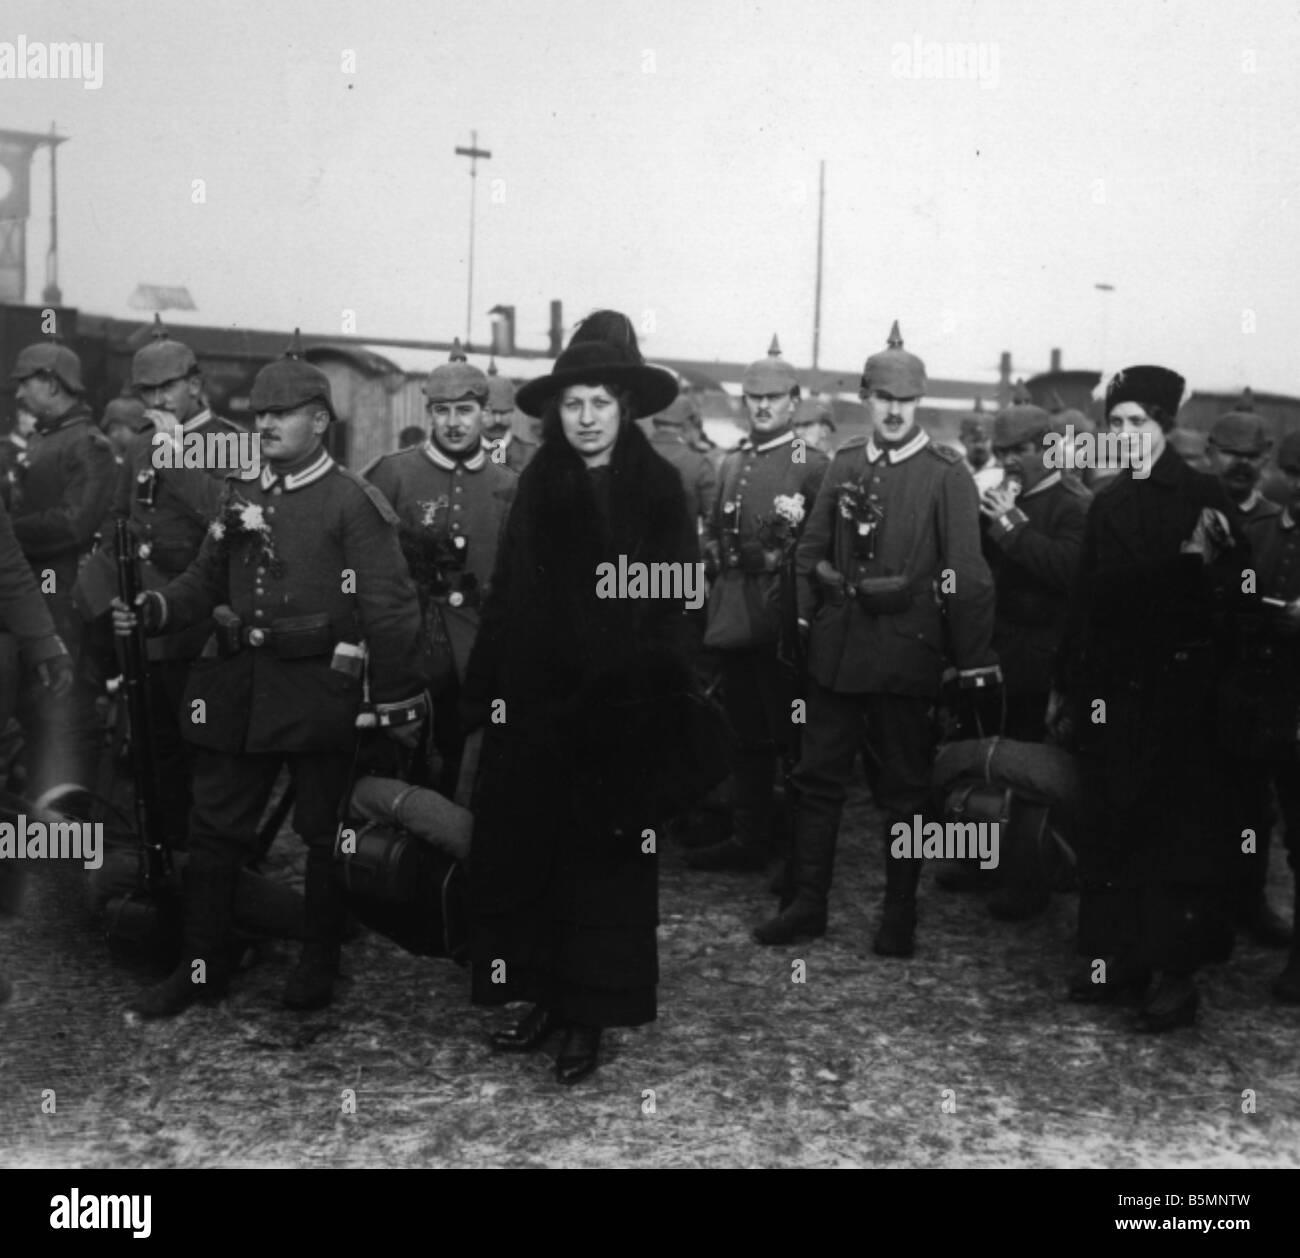 8 1914 0 0 A4 8 E Berlin World War I Troop transport Berlin World War I Scene at a Berlin station platform Women - Stock Image